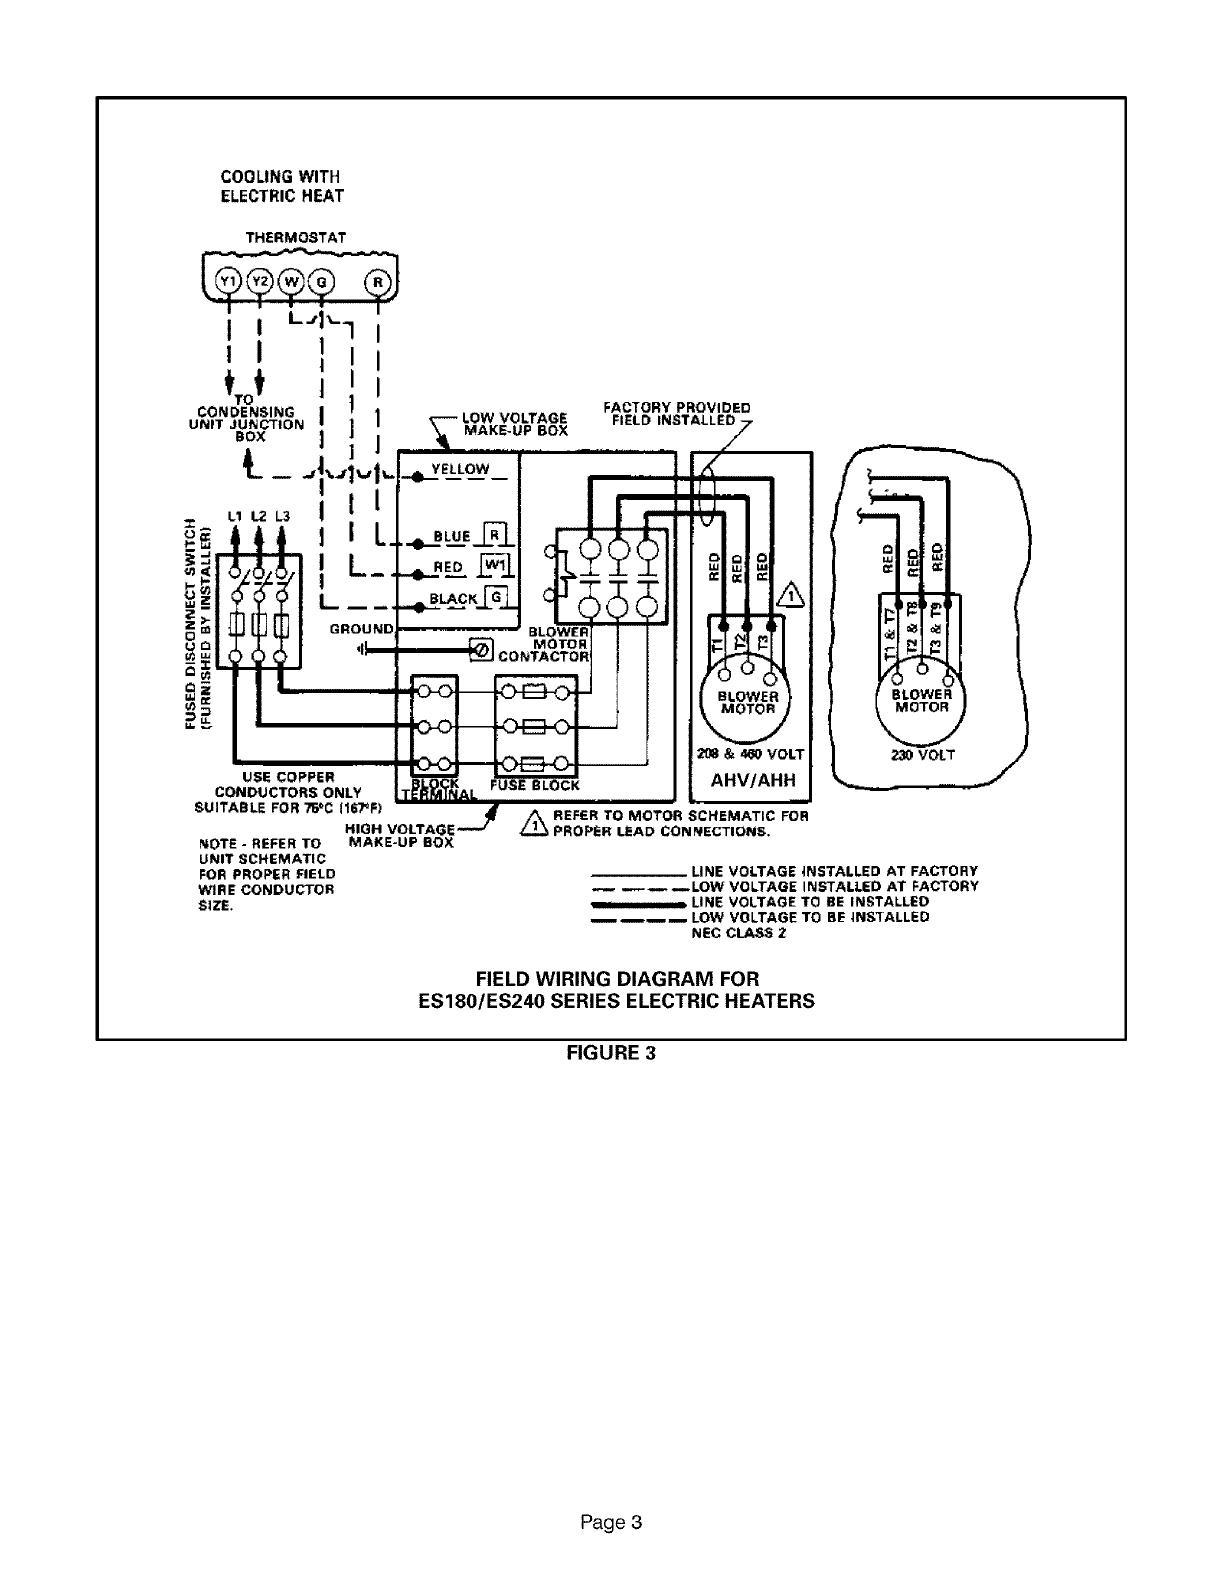 air armstrong air handler auxiliary heater kit manual l0805595 on air  handling unit diagram,